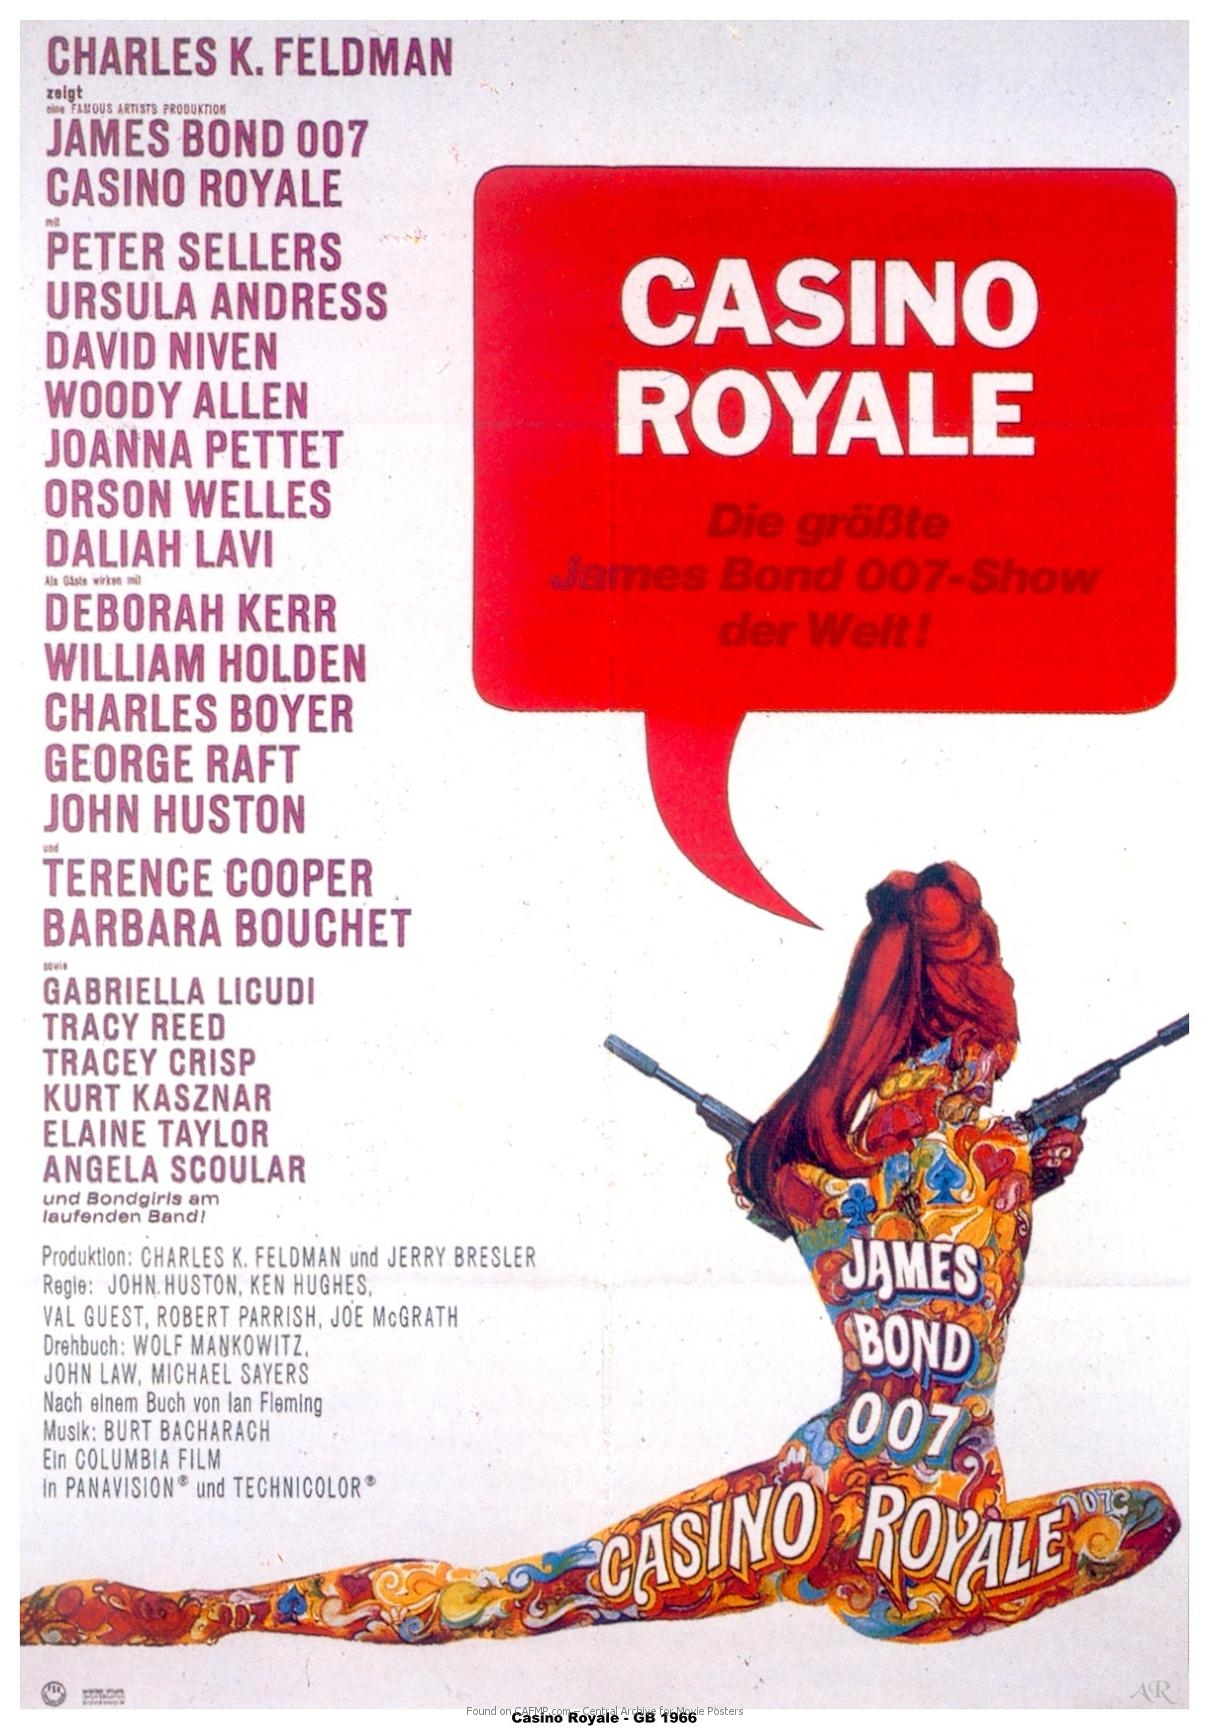 James Bond 007 Casino Royale 1967 Movie Poster Canvas Print David Niven